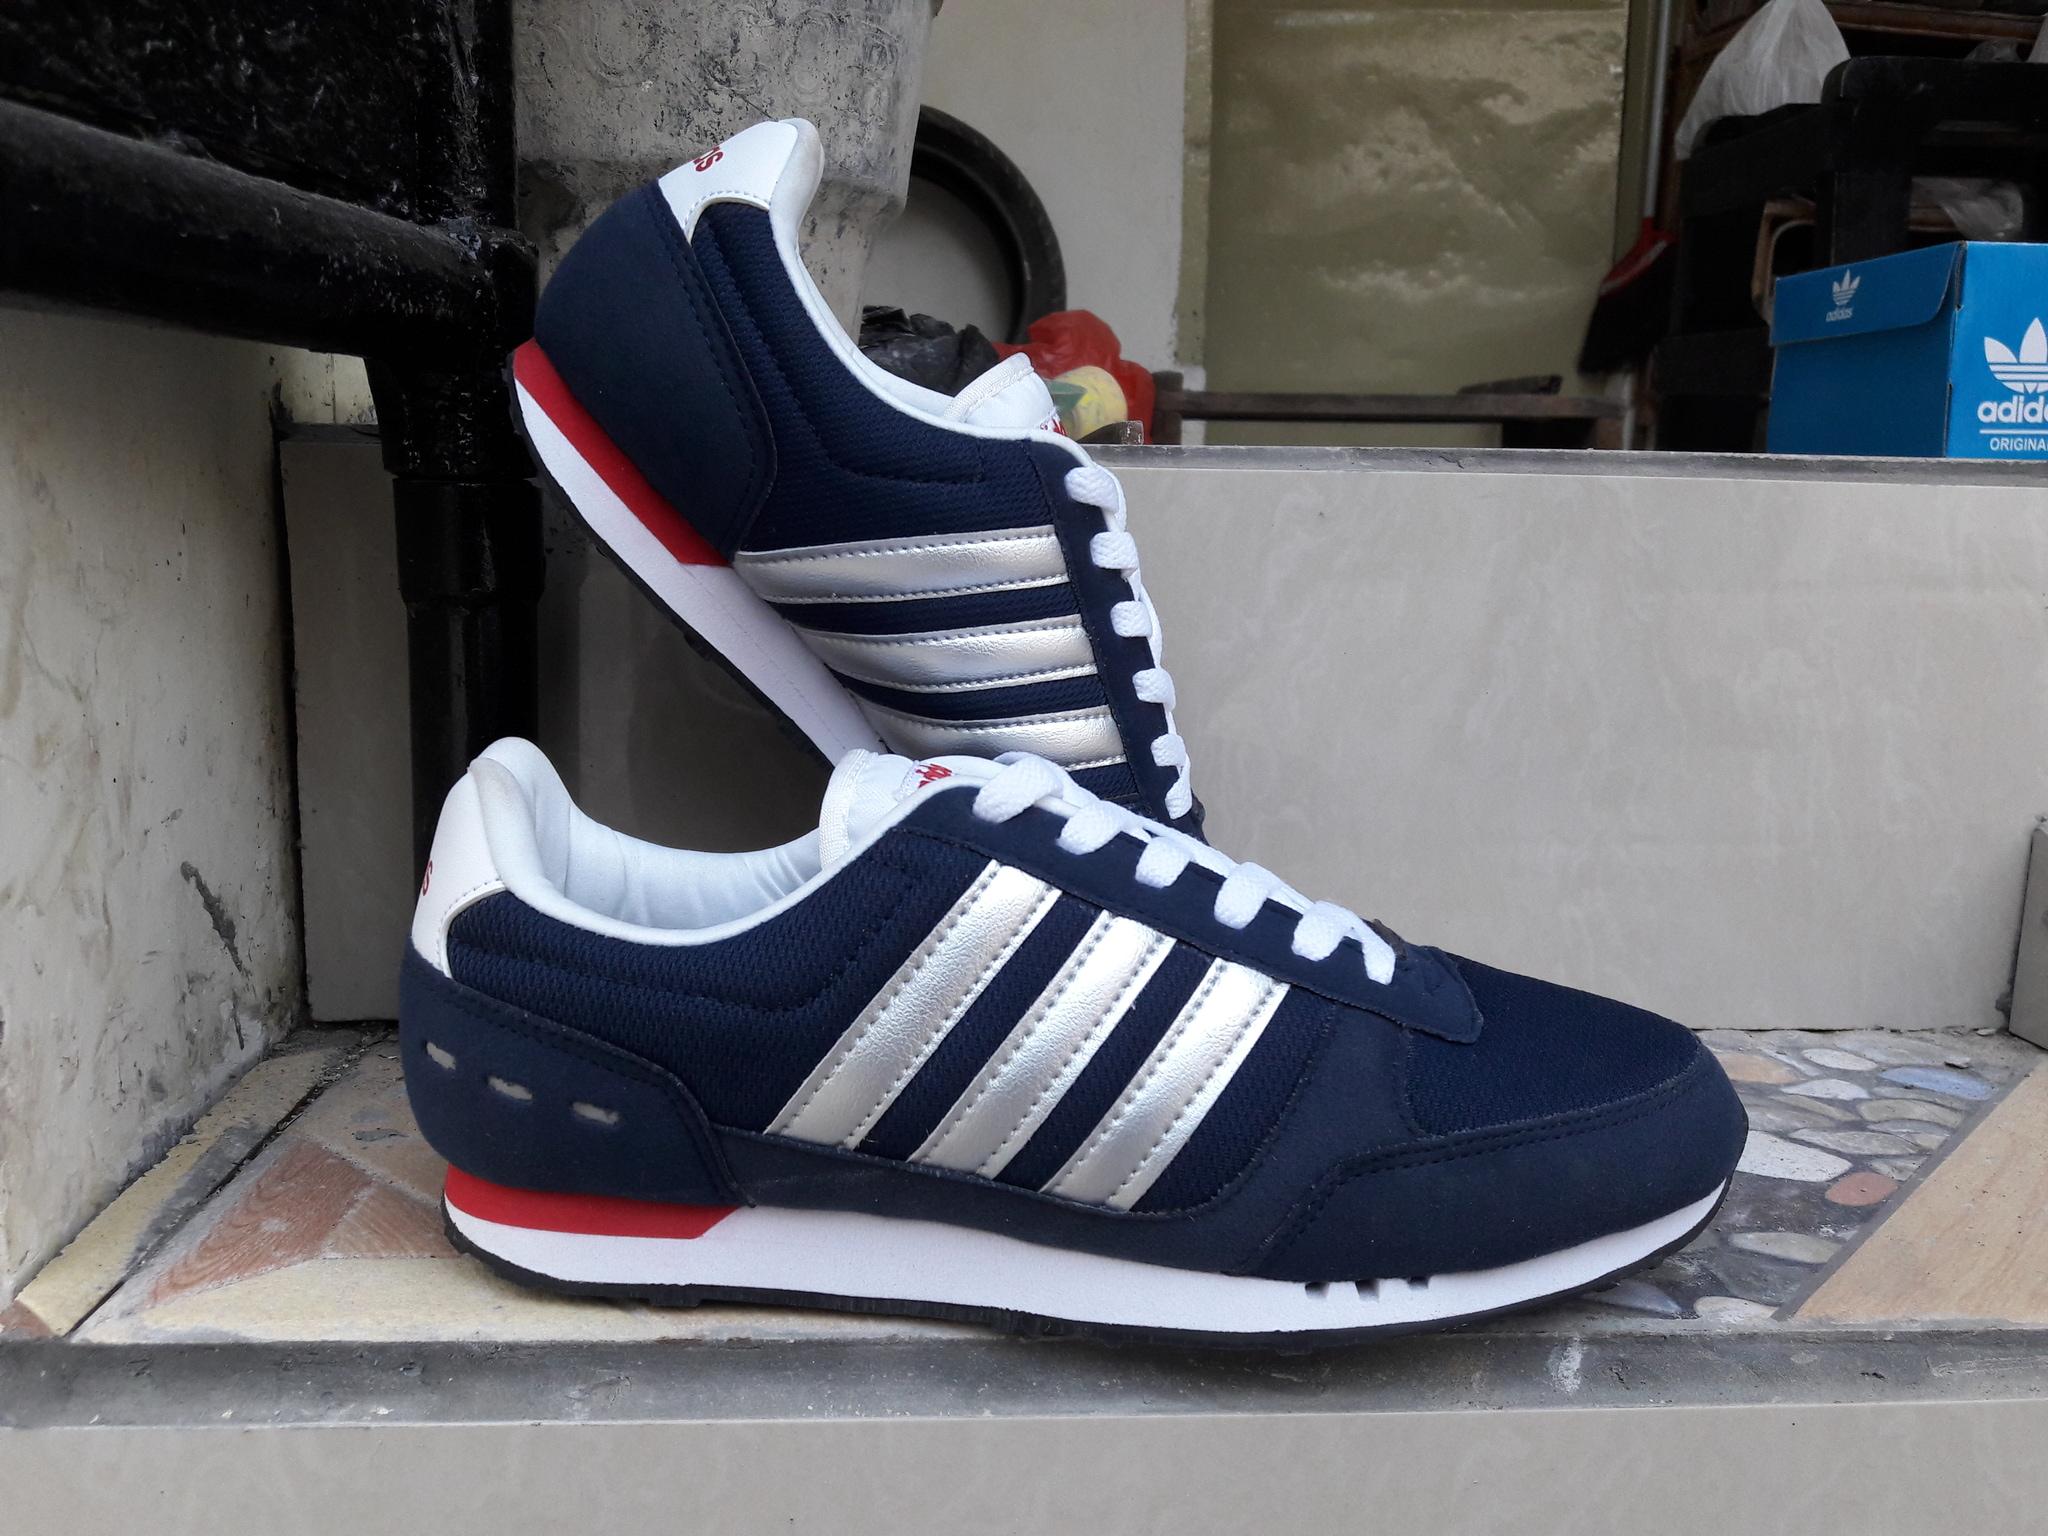 0bf381ef3 ... best price jual adidas neo city racer surabaya 505b0 c16e2